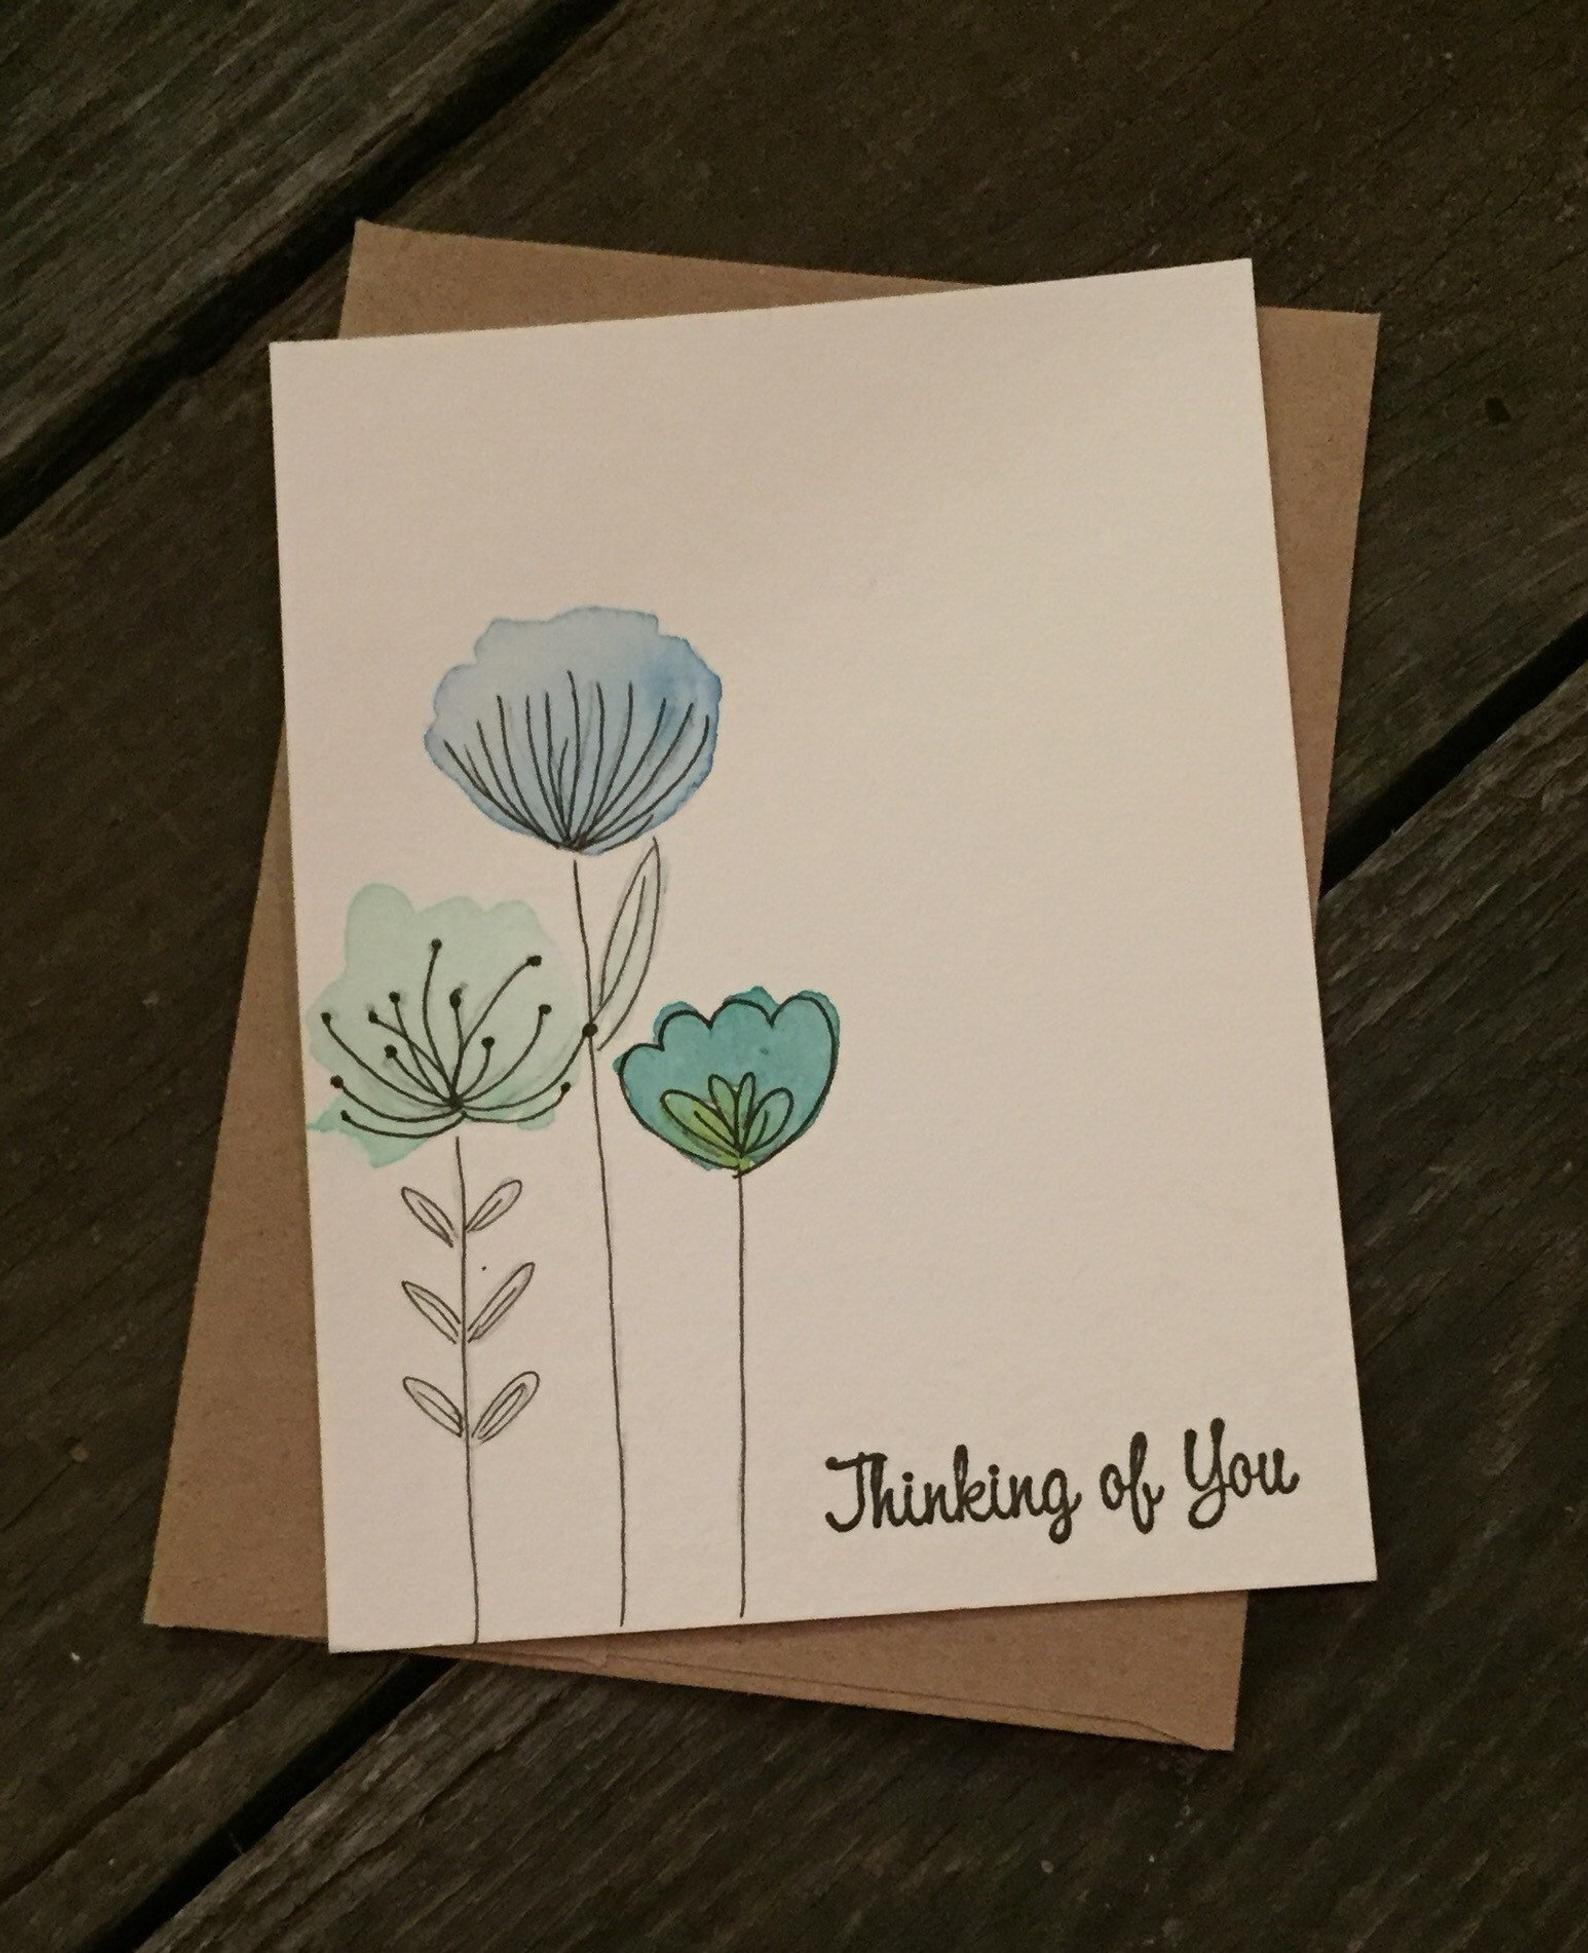 Aquarell angepasste Karten Geburtstagskarten Nur weil | Etsy